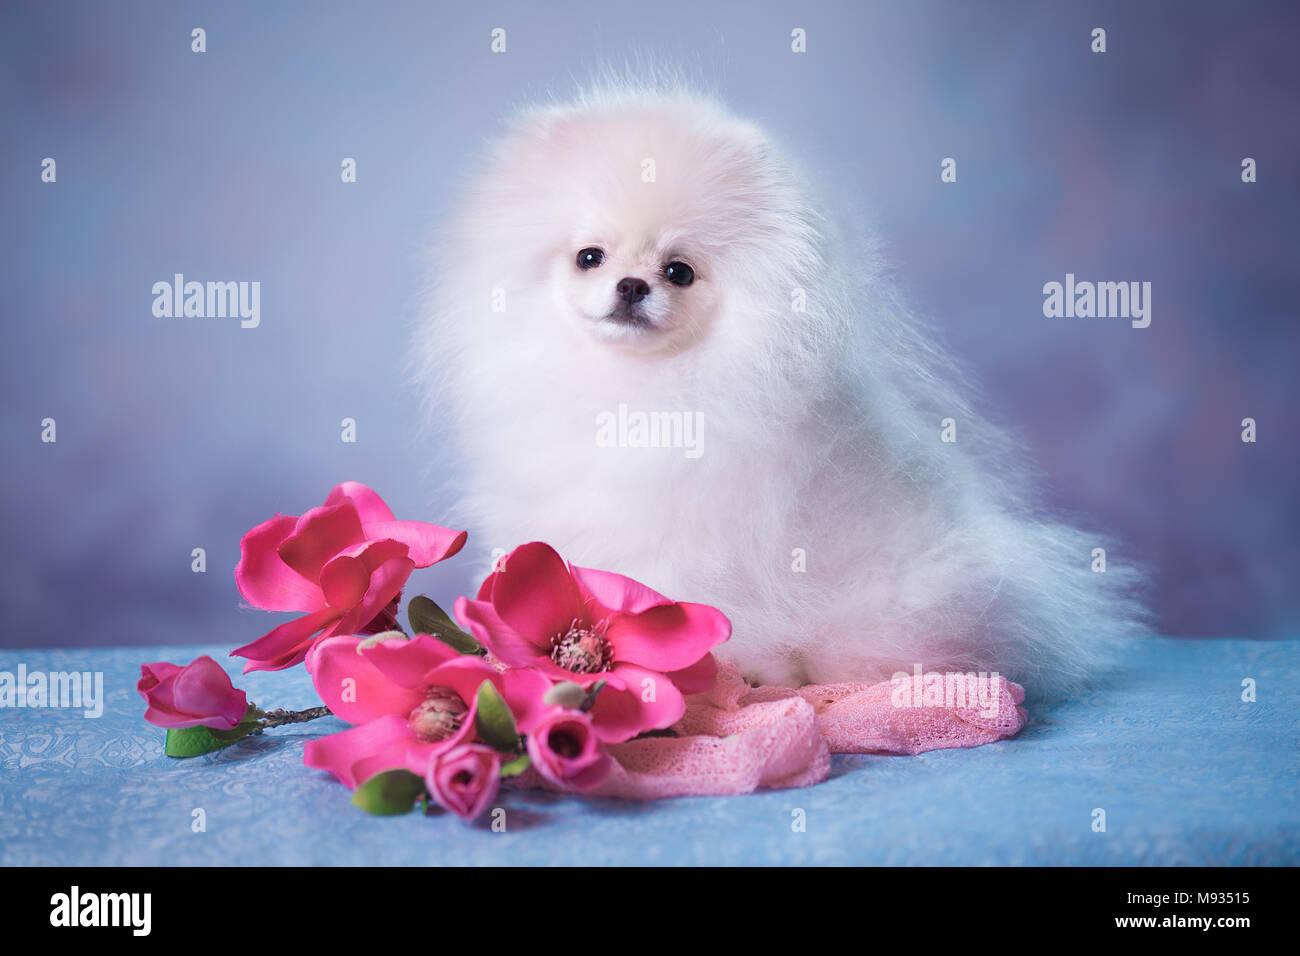 Cute White Fluffy Puppy Stock Photo Alamy